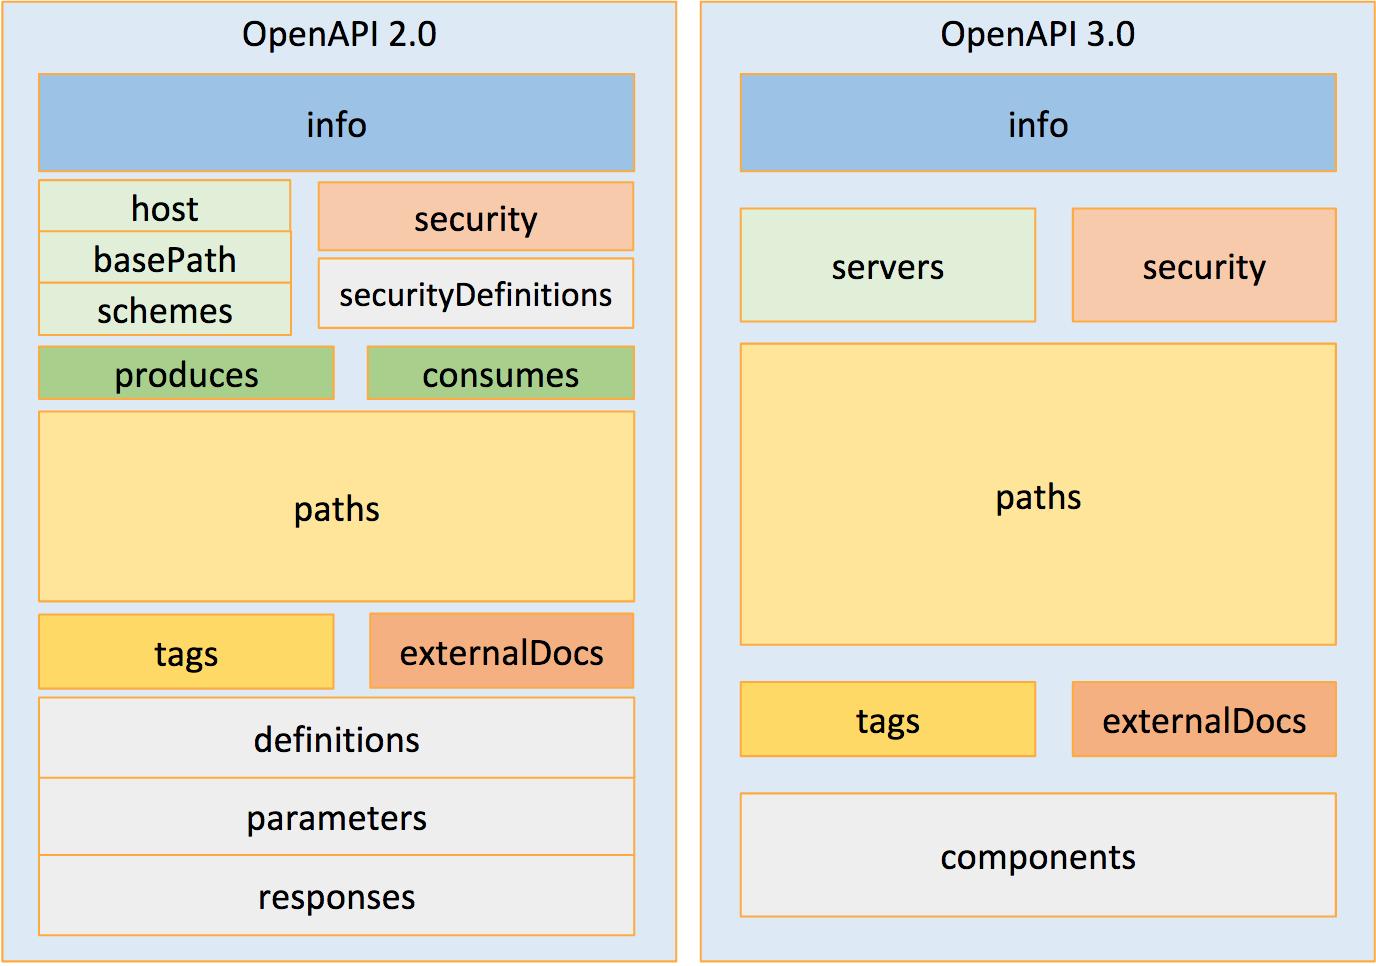 Open API Initiative Announces Release of the OpenAPI Spec v3